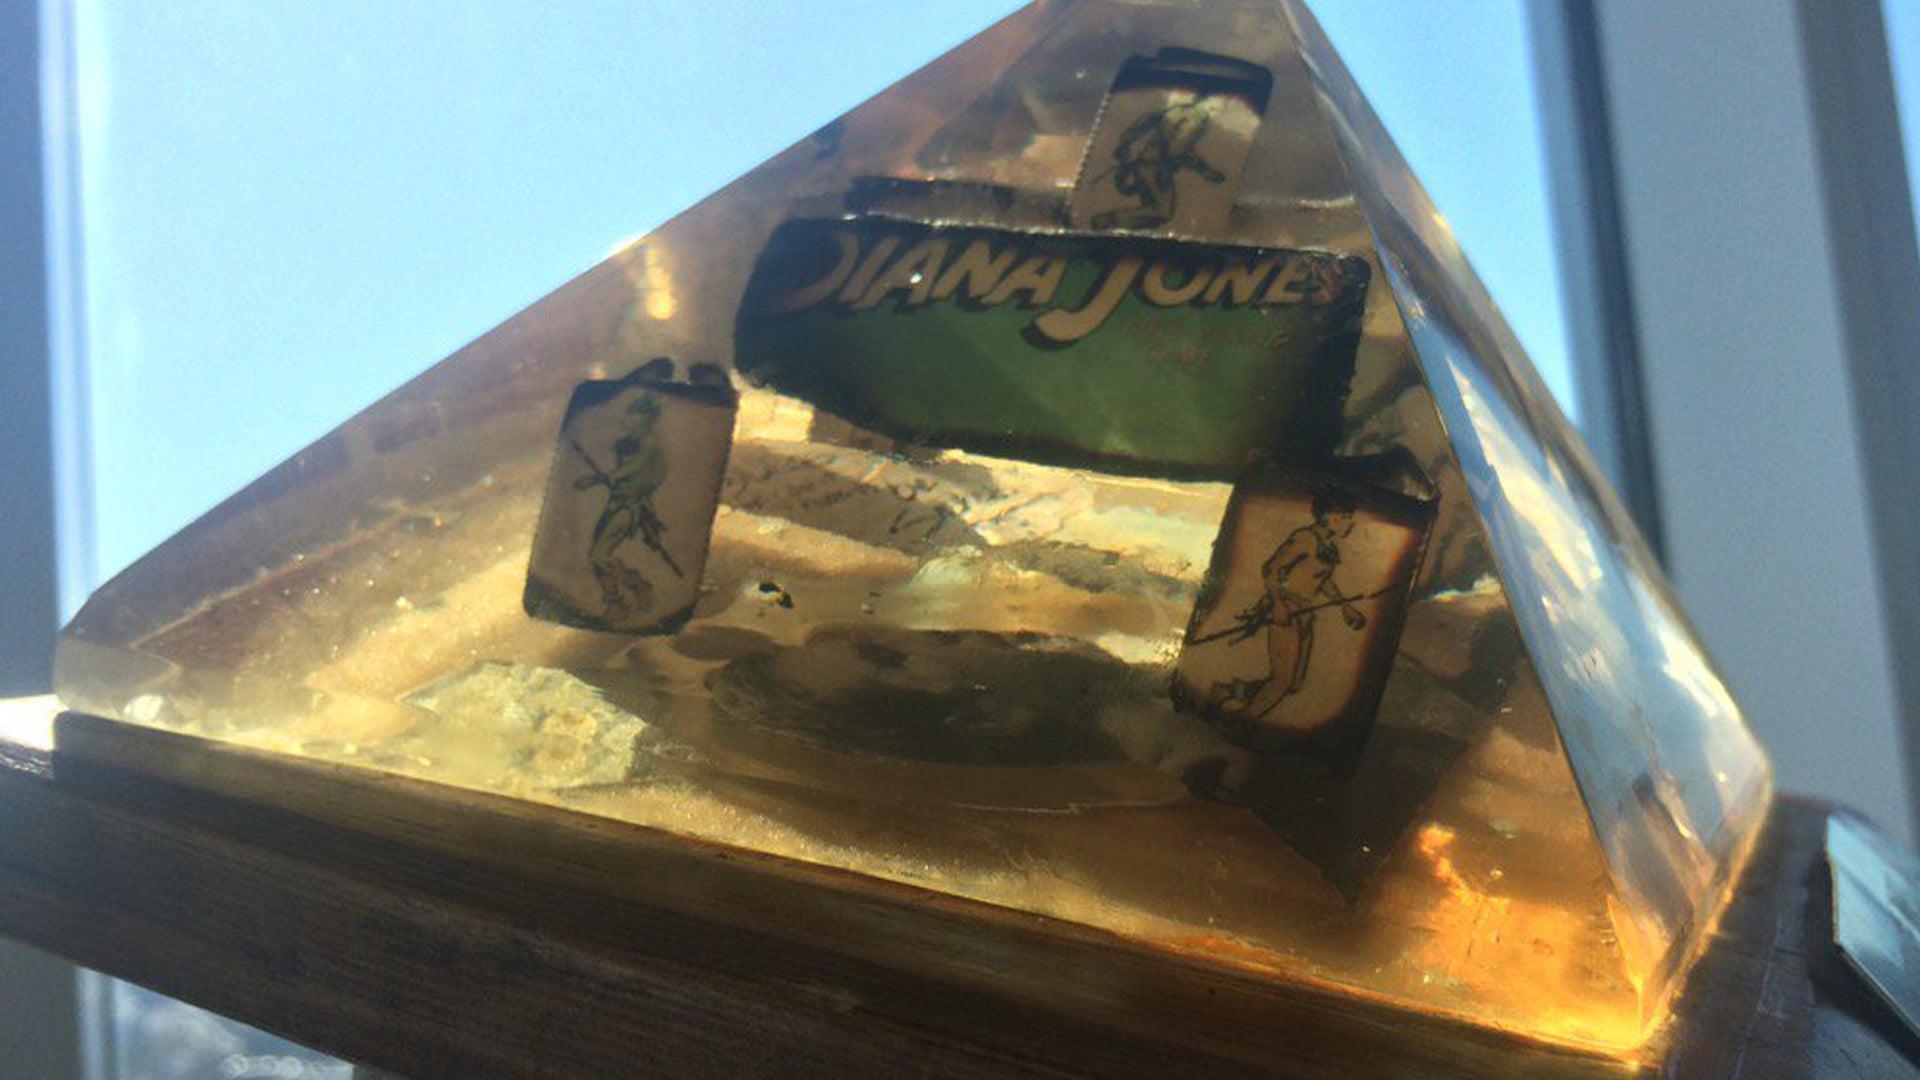 The Diana Jones Award trophy